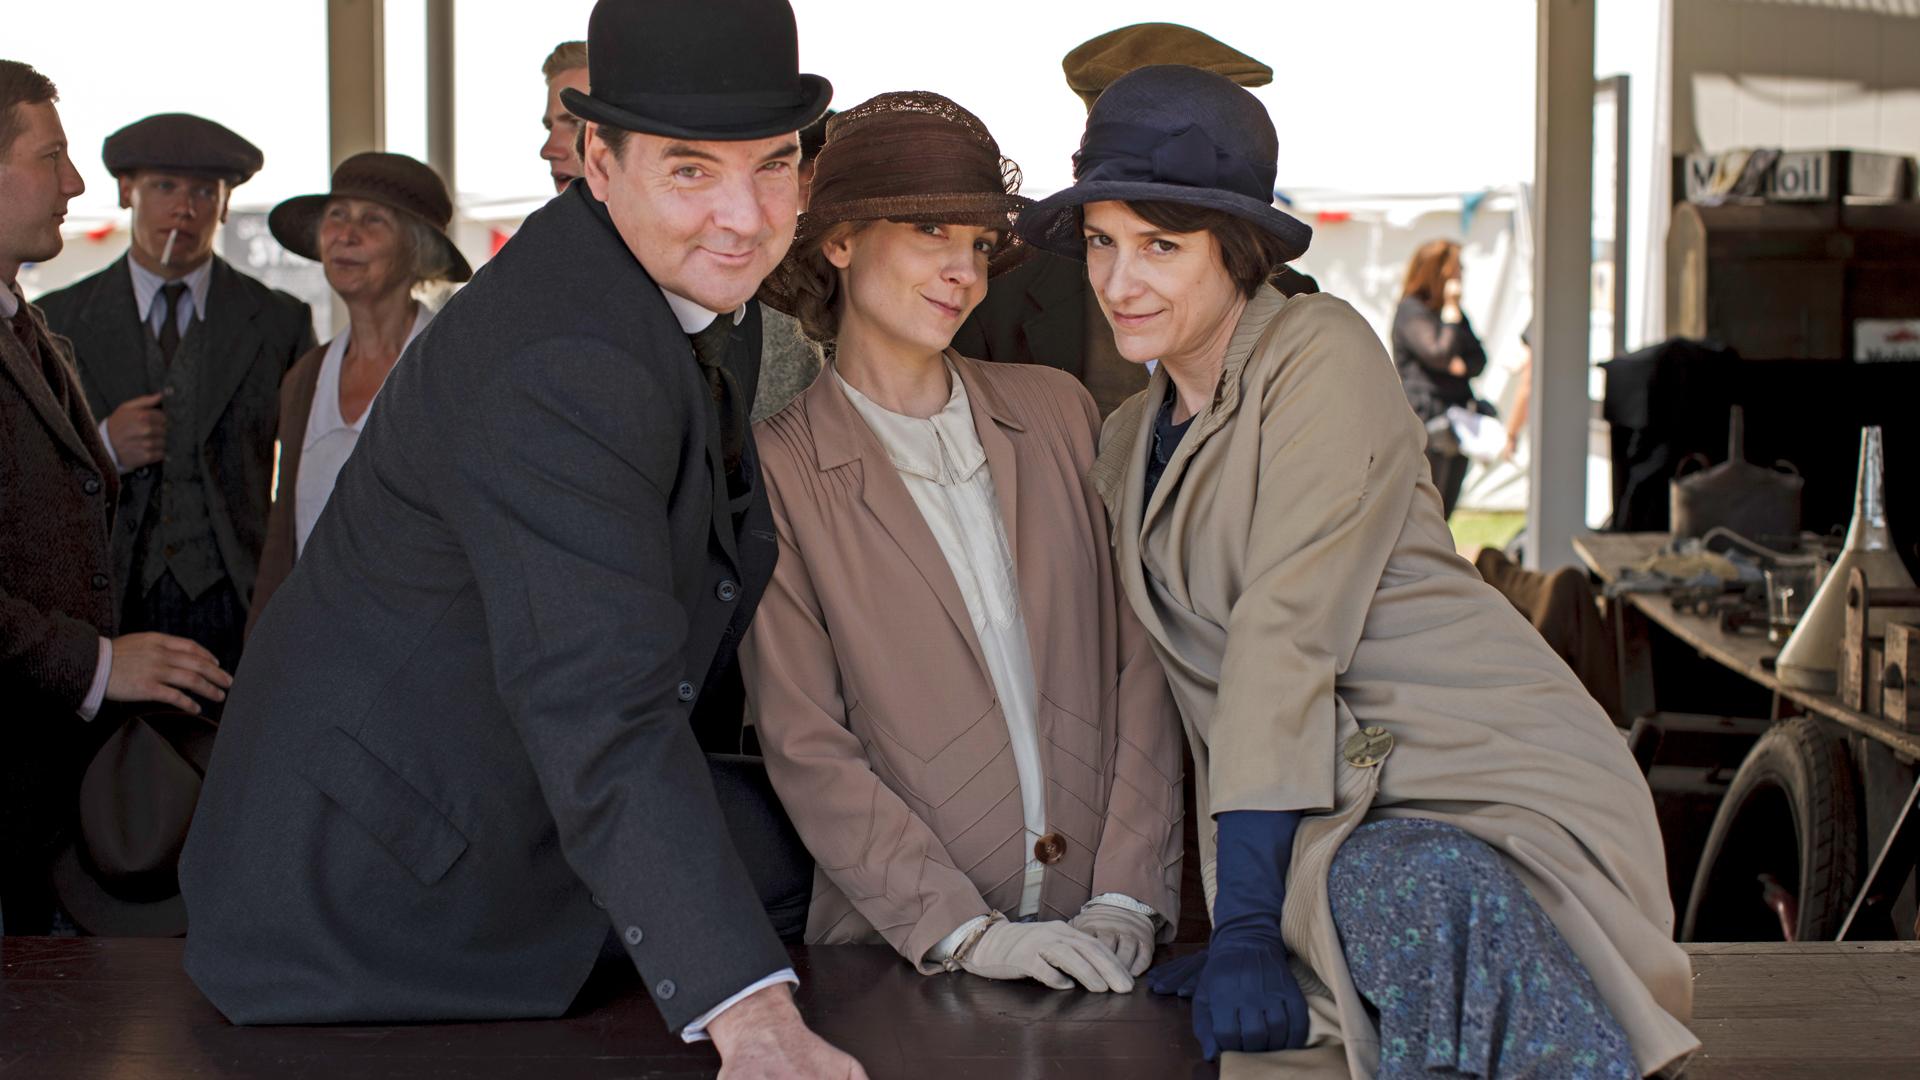 Downton Abbey, Season 6: Episode 7 Behind the Scenes | 7. Episode 7 | Season 6 | Downton Abbey ...